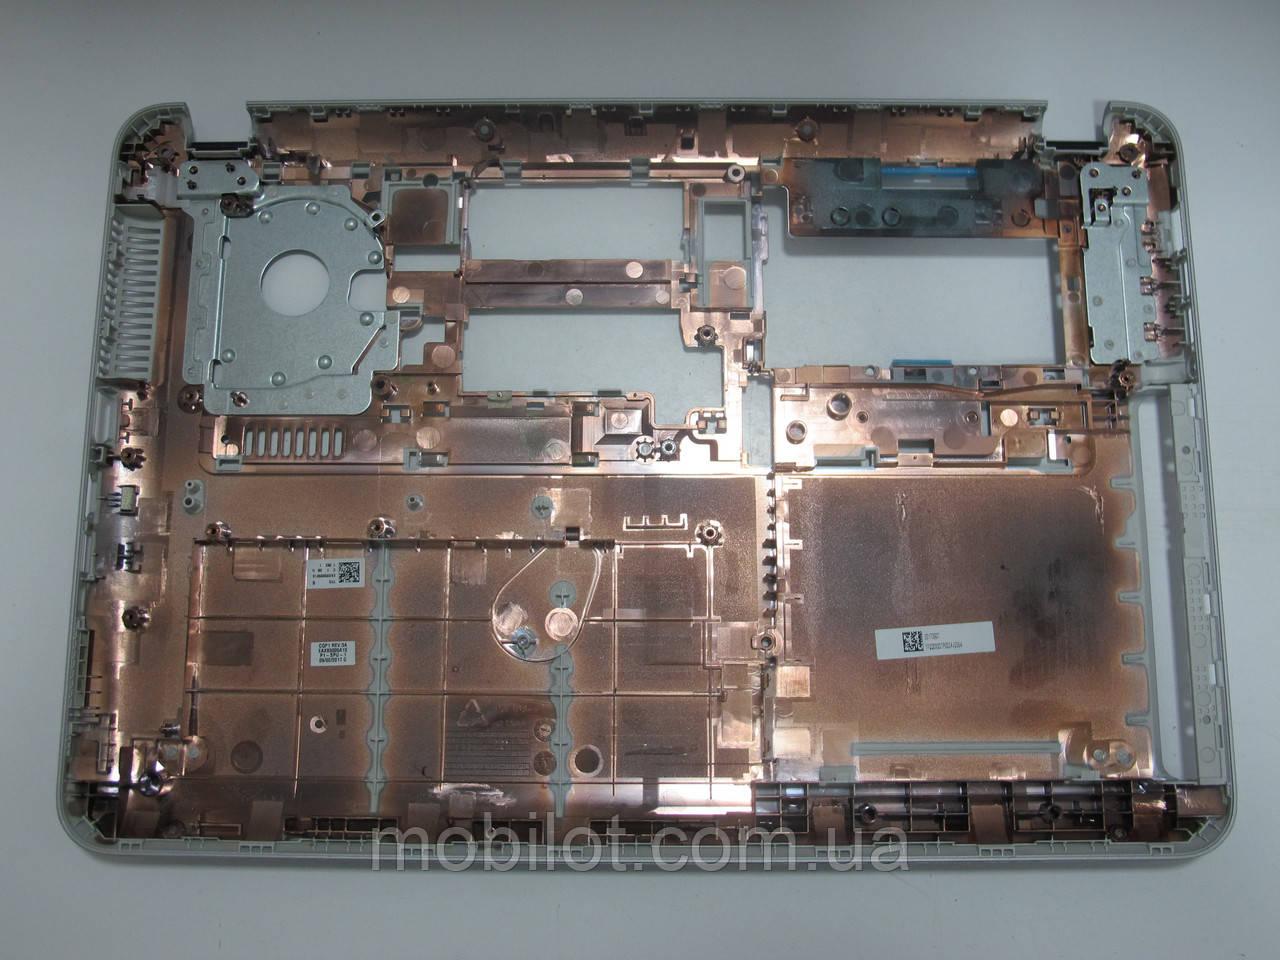 Часть корпуса (Поддон) HP 450 G4 (NZ-7352)